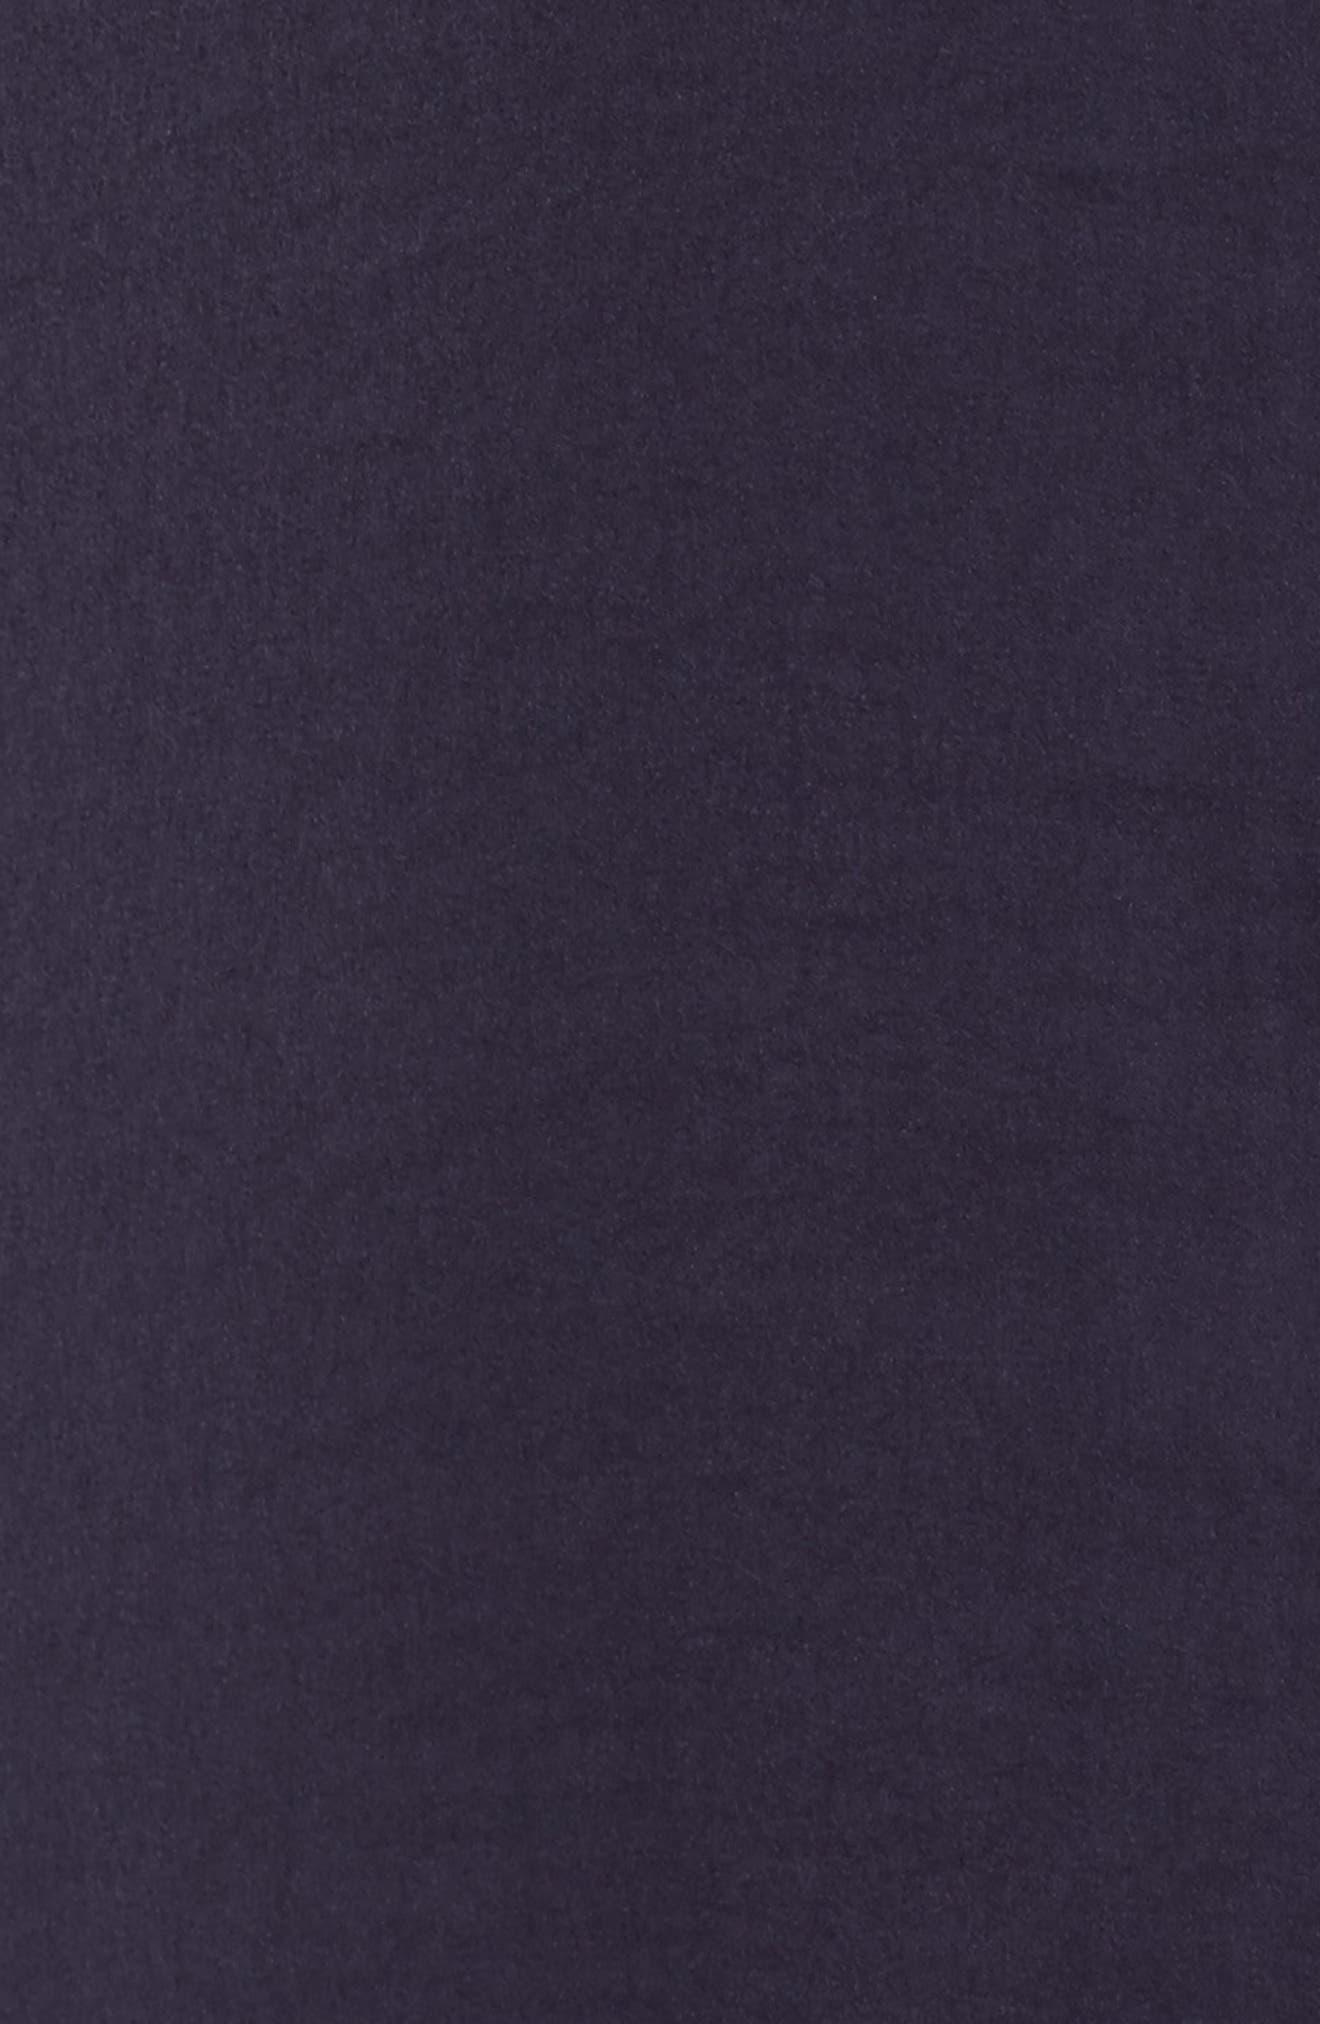 Satin Maxi Sleep Shirt,                             Alternate thumbnail 6, color,                             Plum